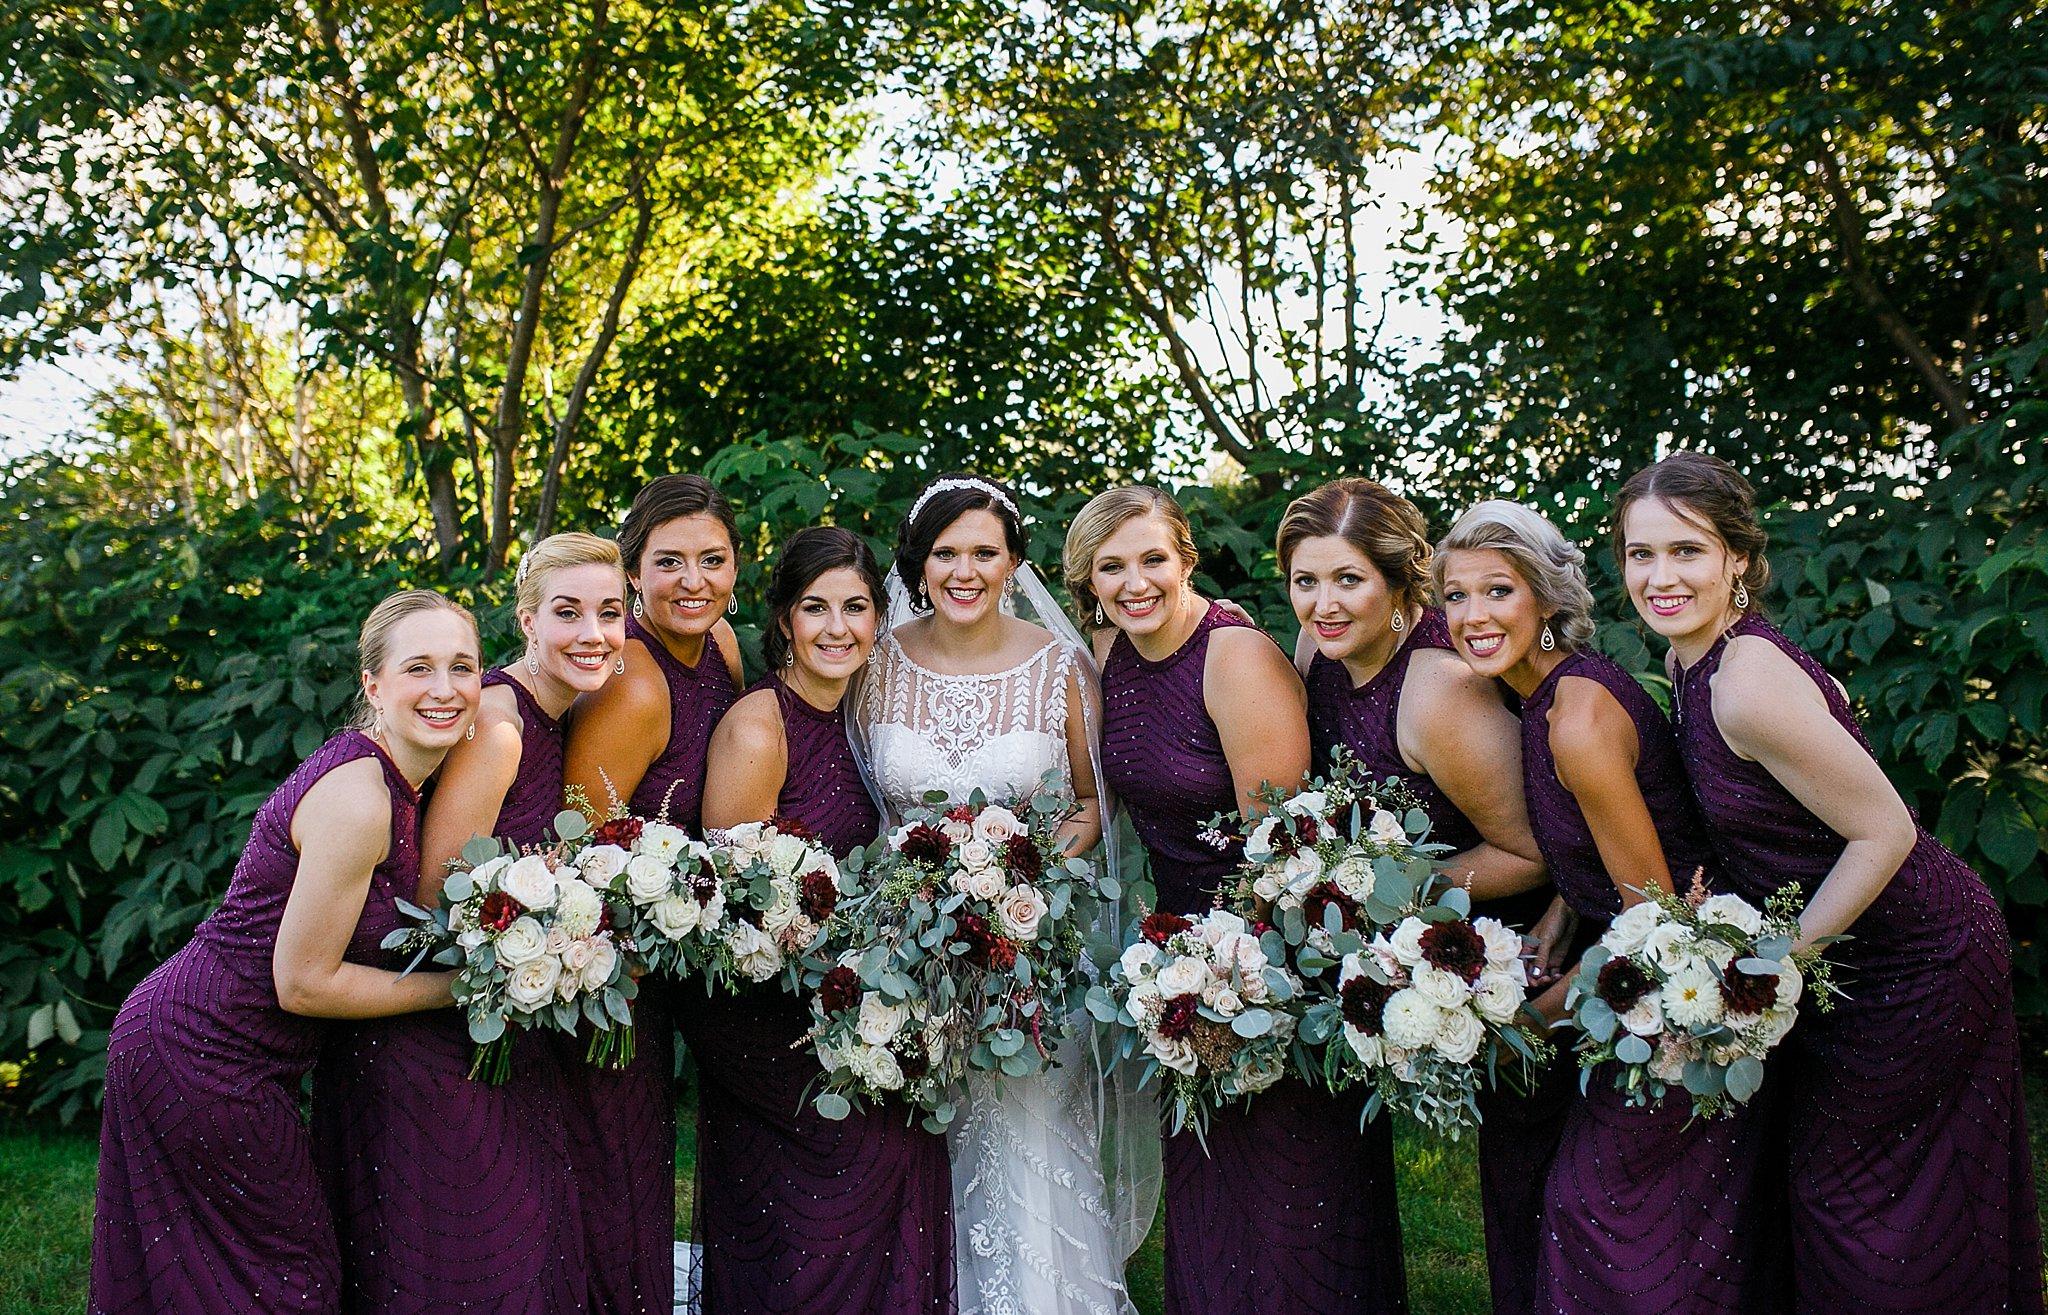 West Hills Country Club Wedding Gatsby Wedding Roaring Twenties Wedding Hudson Valley Wedding Photographer Sweet Alice Photography46.jpg